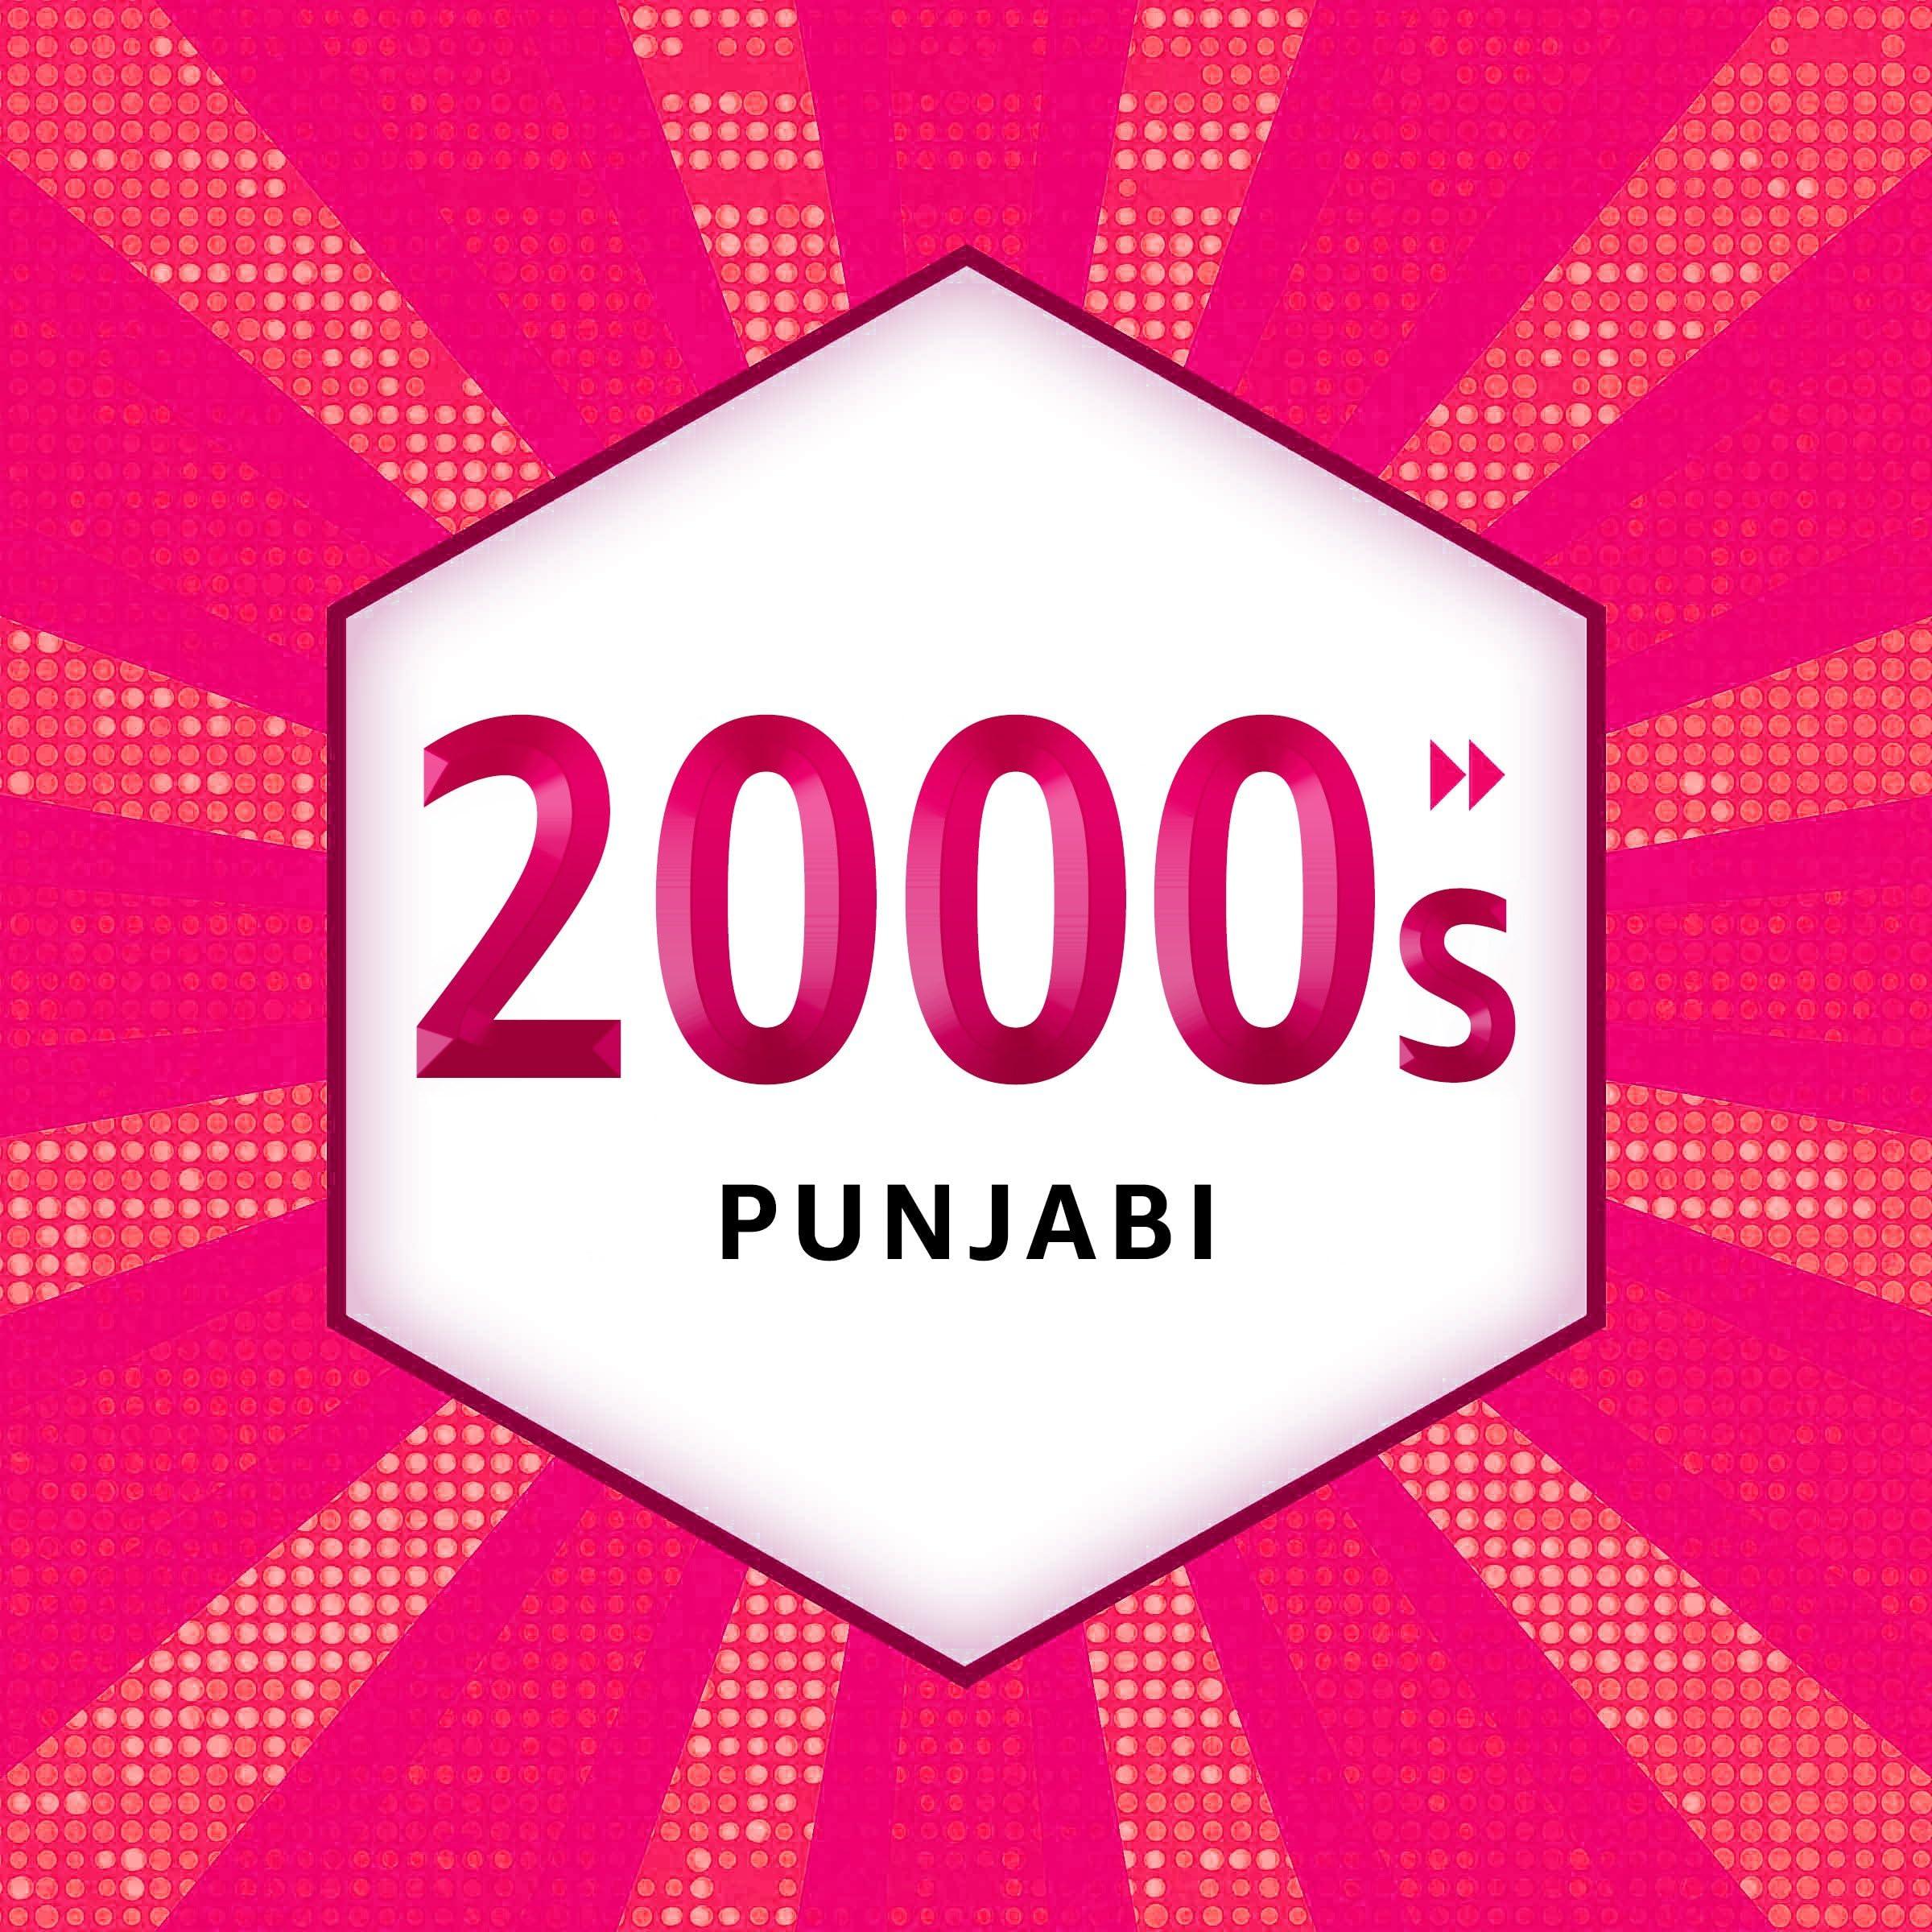 2000s Punjabi